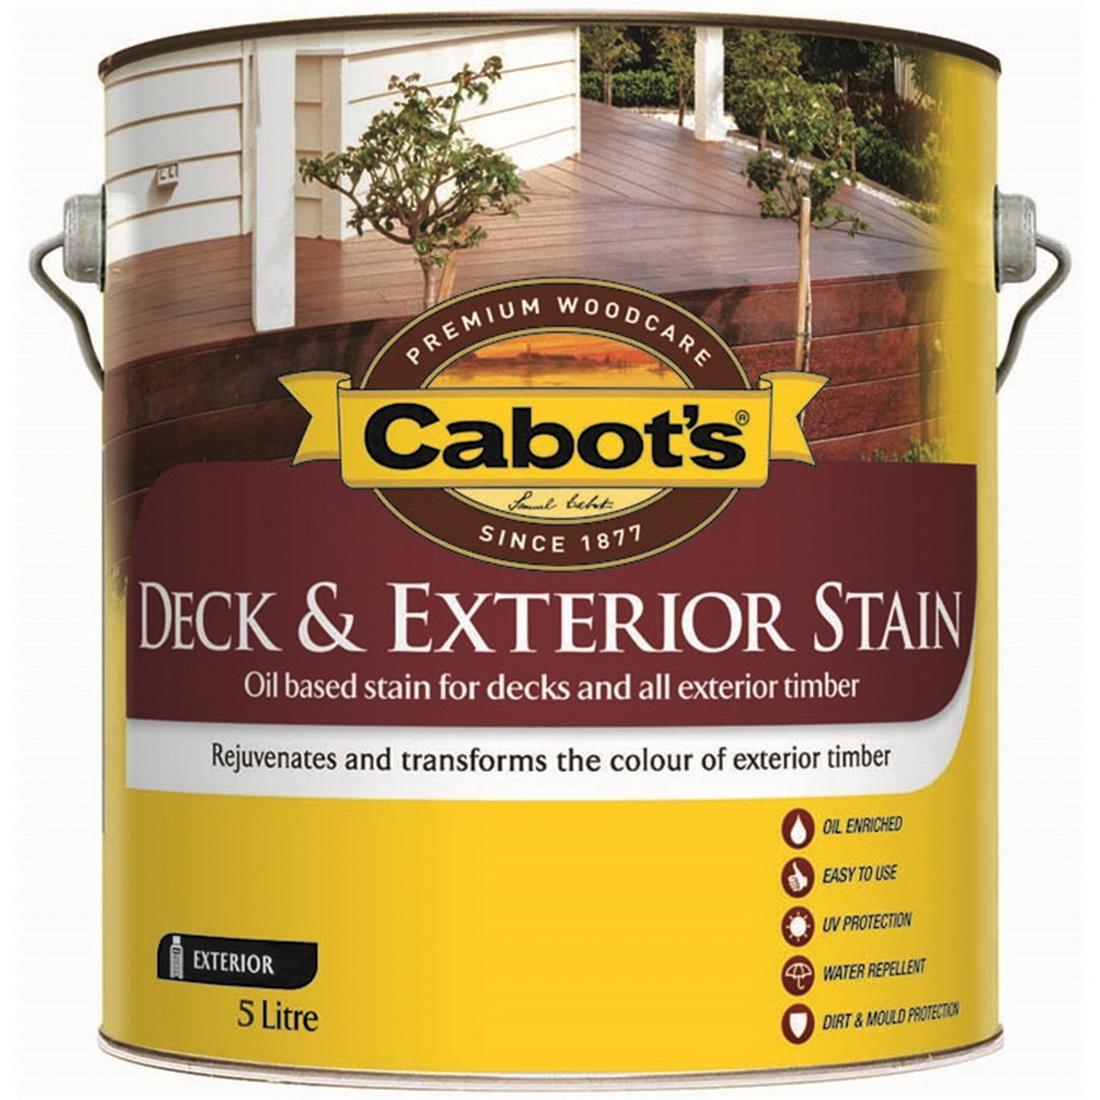 Deck & Exterior Stain Oil Based Cedar 5L 826W0142-5L